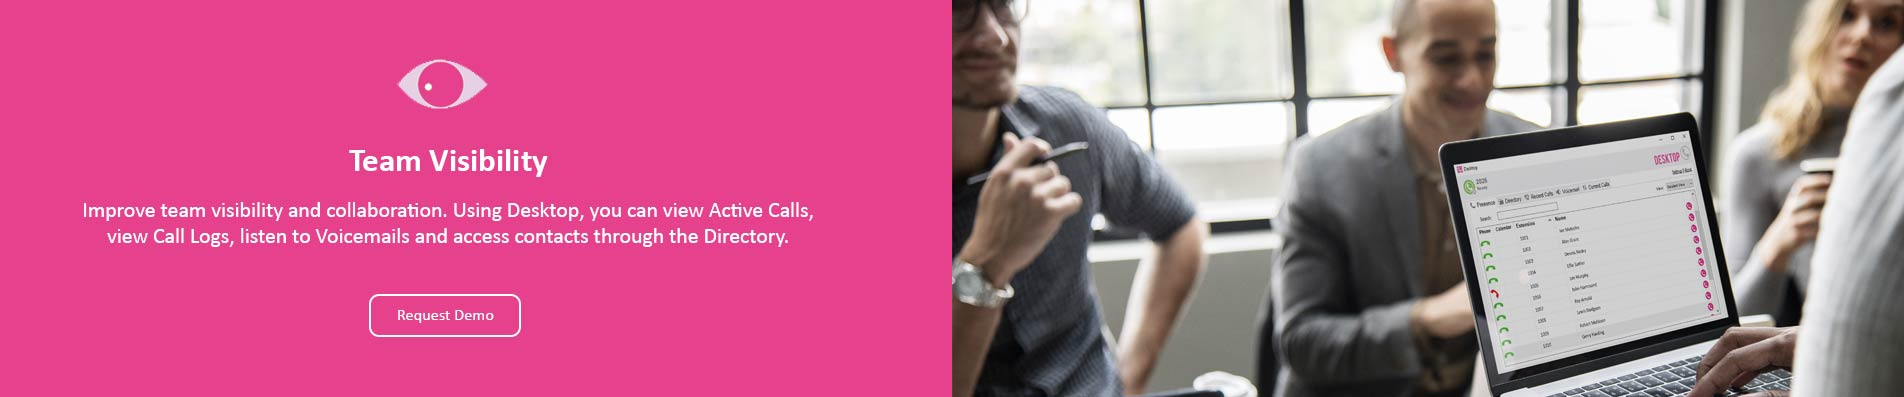 Team Visibility Hello Telecom Contrex Desktop